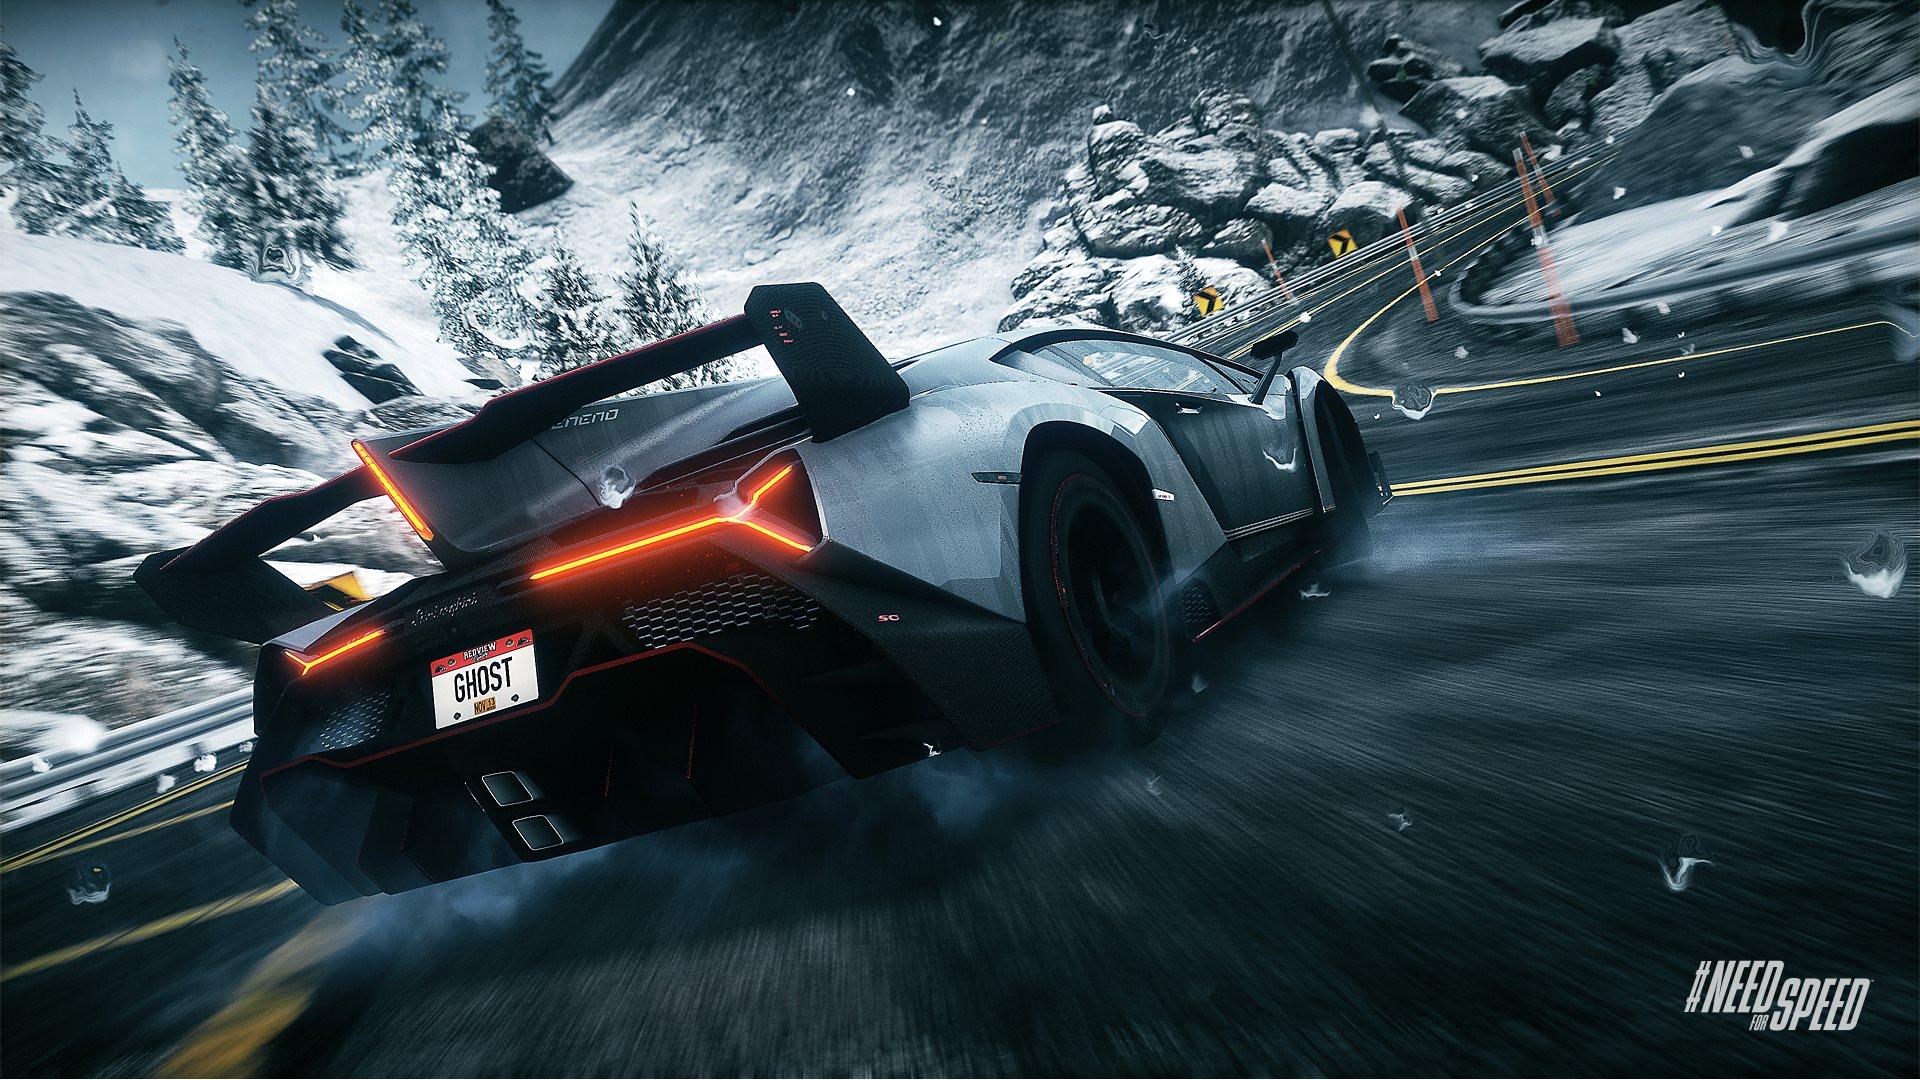 Lamborghini Veneno Need For Speed Wiki Fandom Powered By Wikia